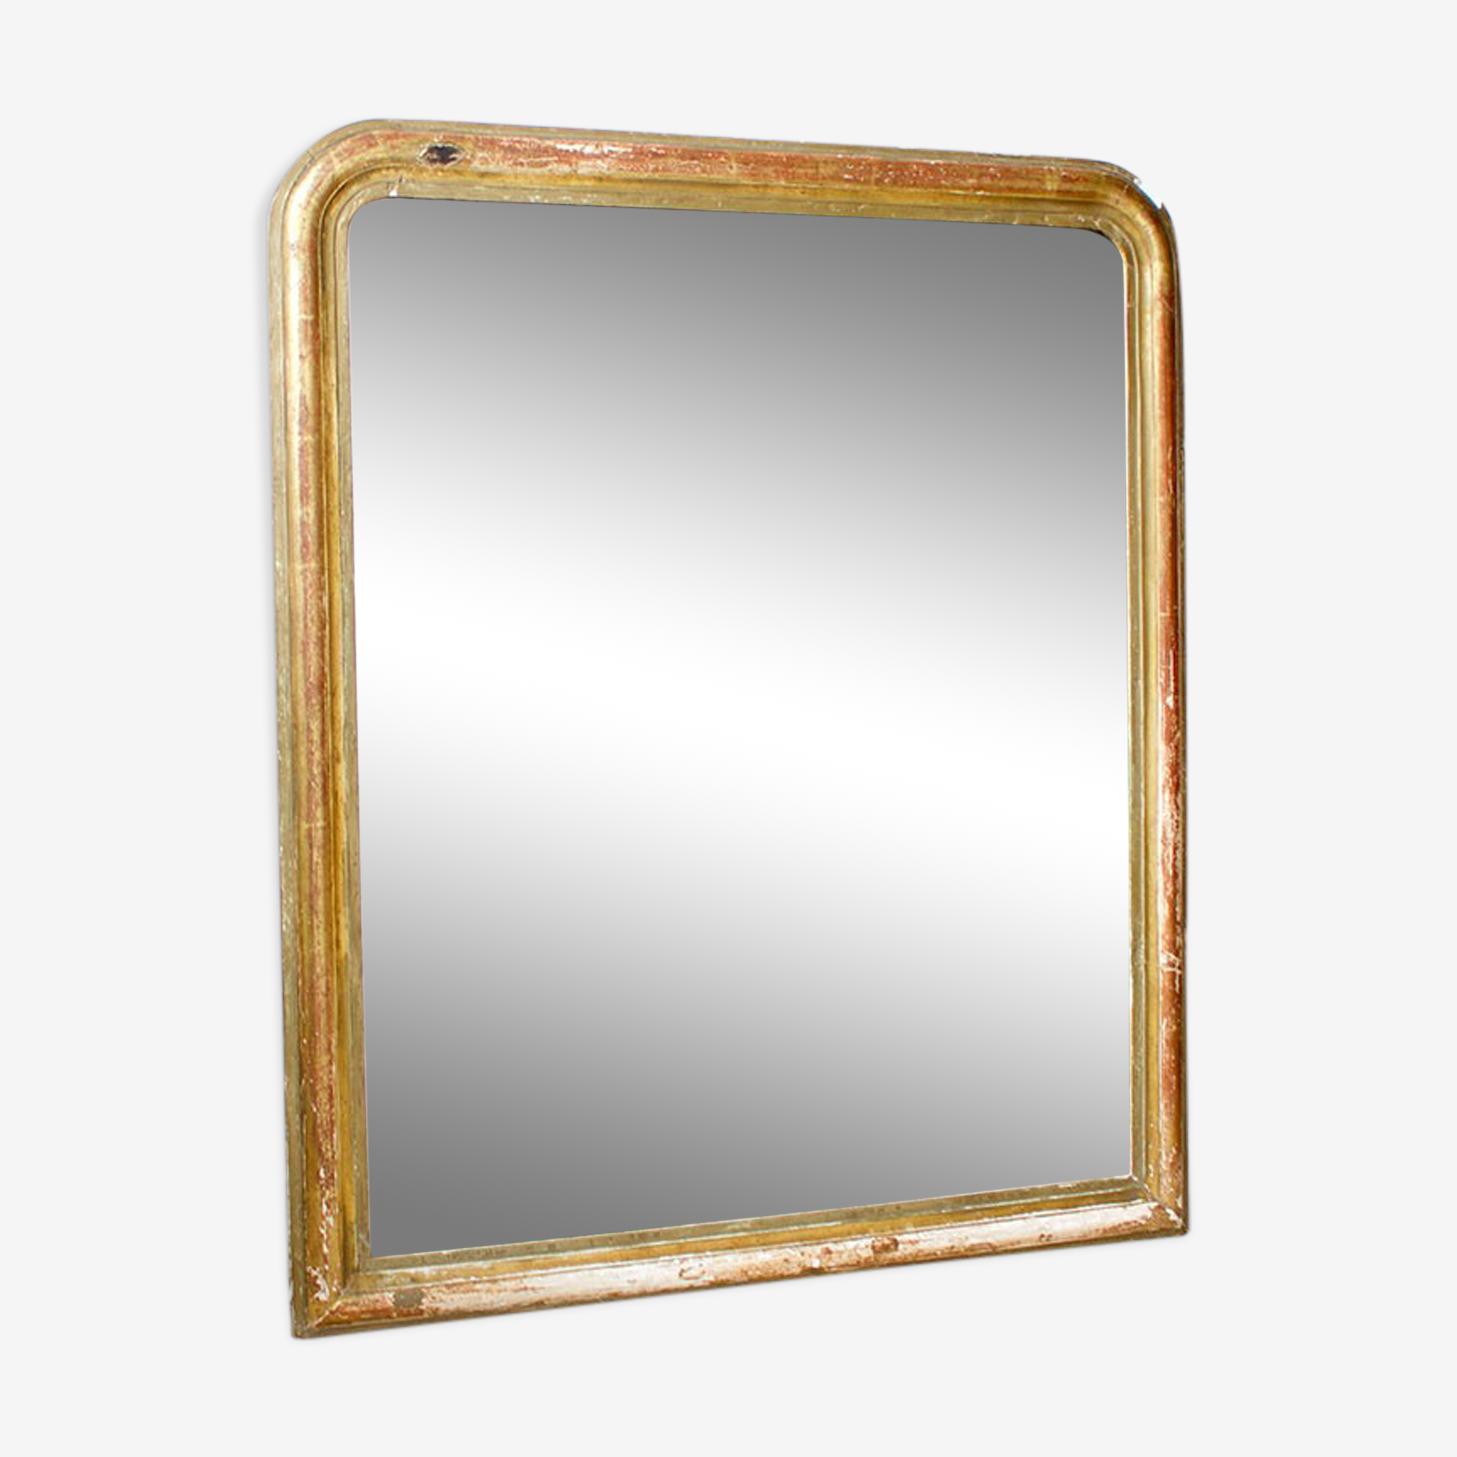 Gilded in gold leaf mirror 80x68cm